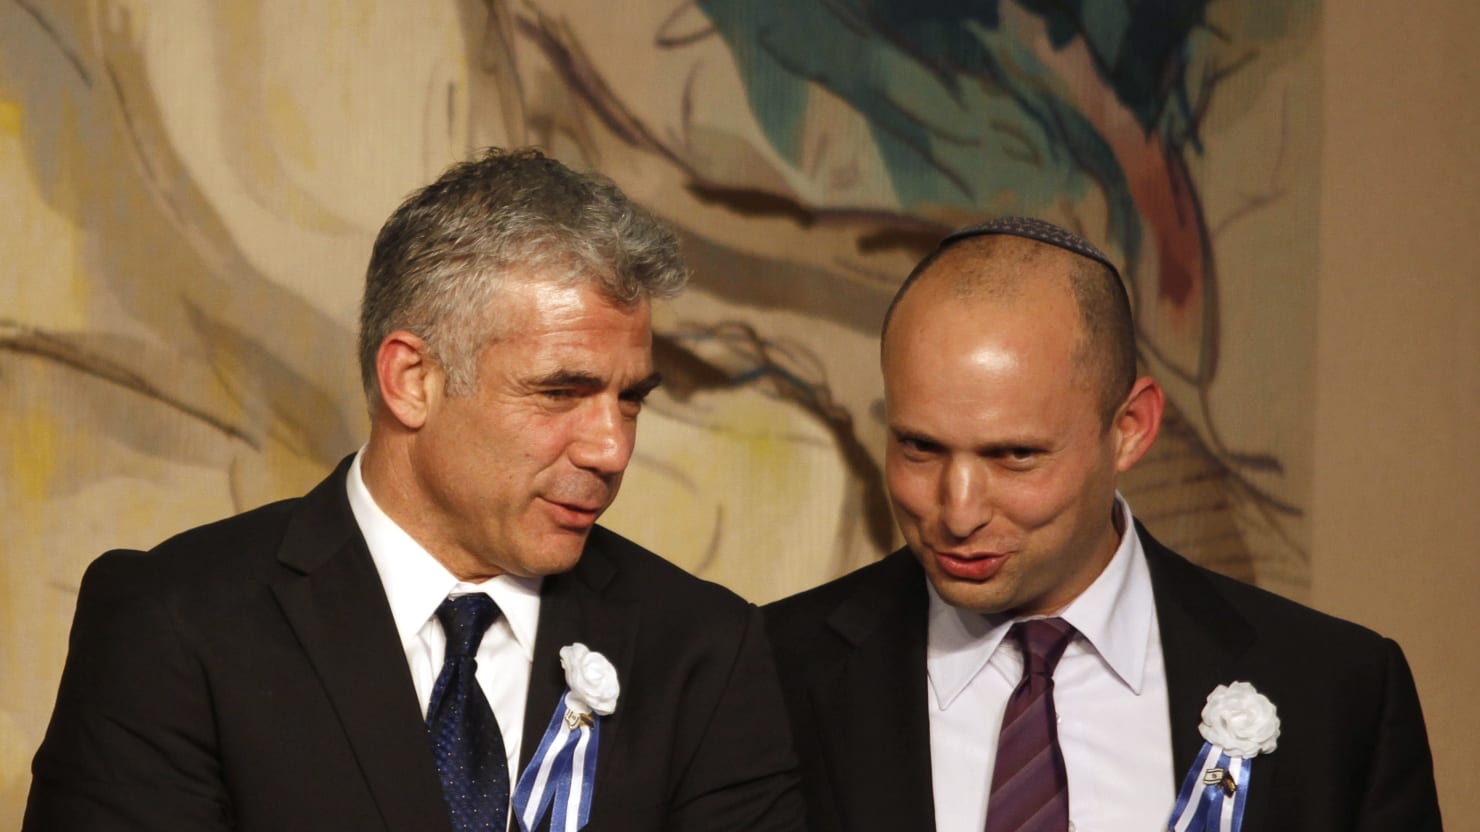 Lapid Demands Civil Marriage In Israel